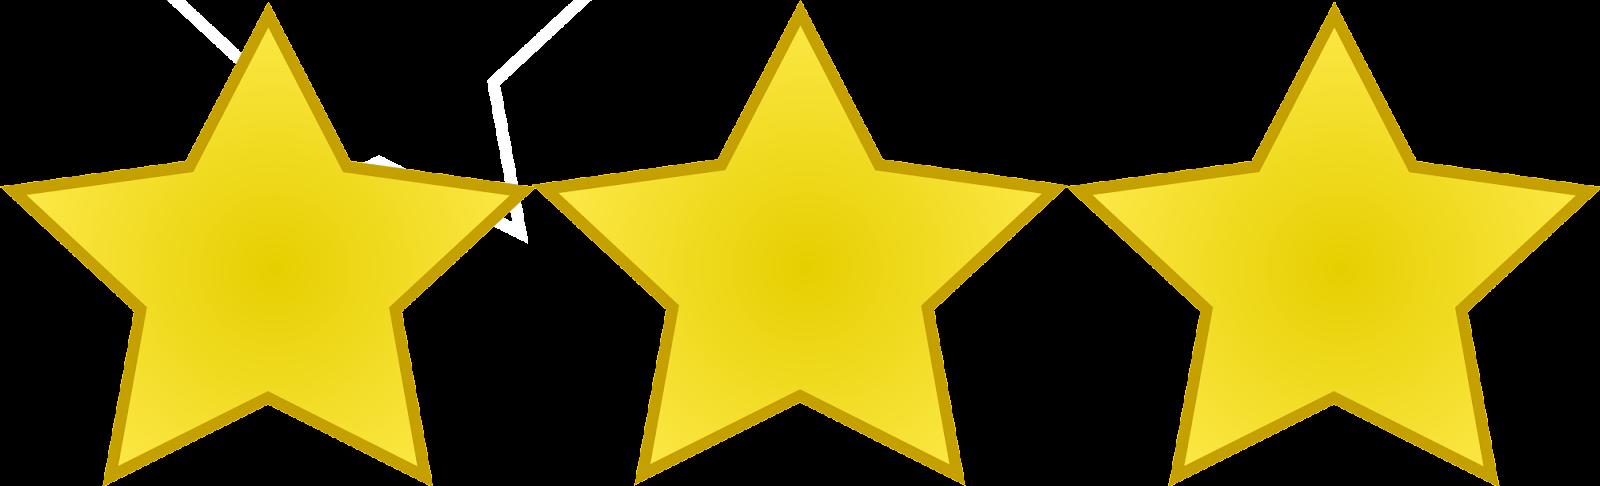 File:Emblem-stars-3.svg - Wikimedia Commons